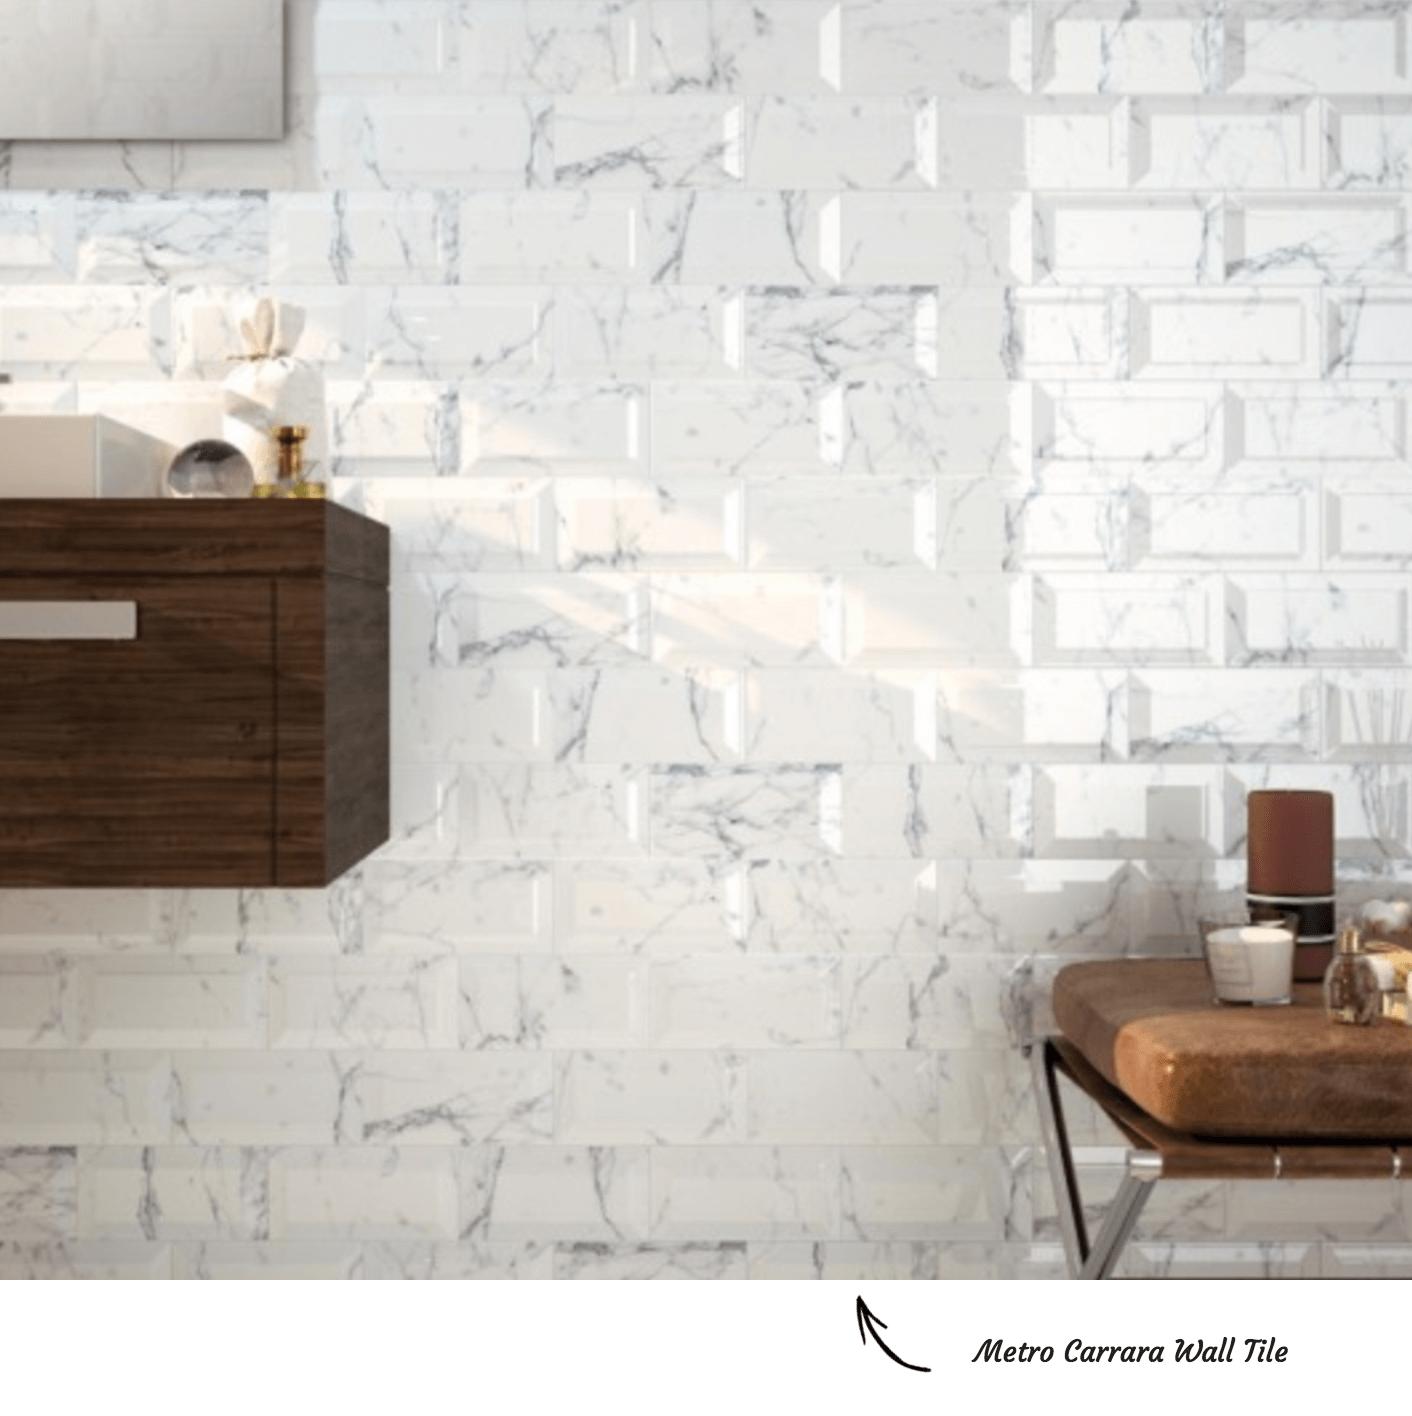 Metro Carrara Brick Bond Tile Pattern